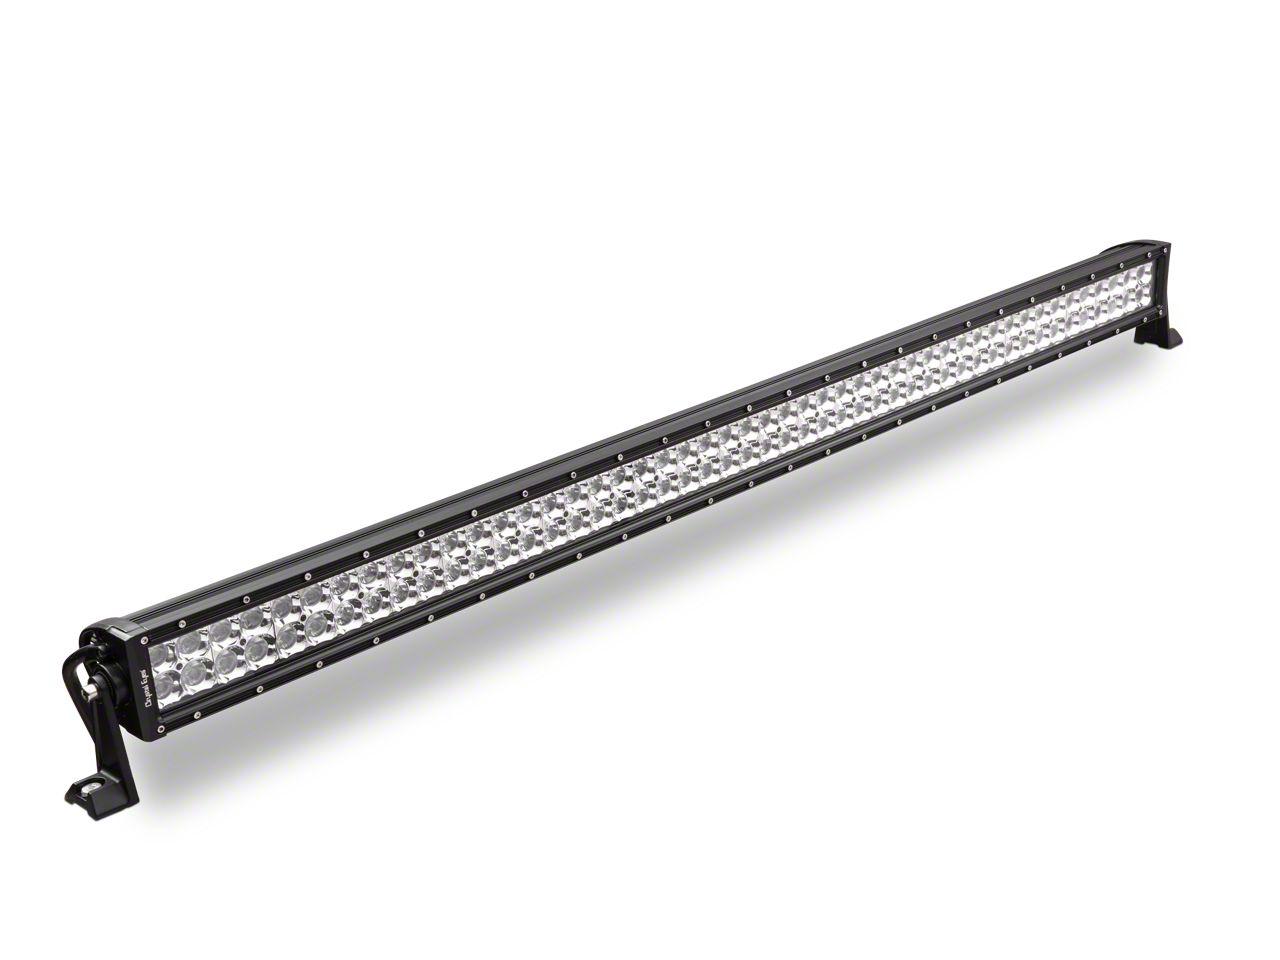 Alteon 50 in. 11 Series LED Light Bar - Flood/Spot Combo